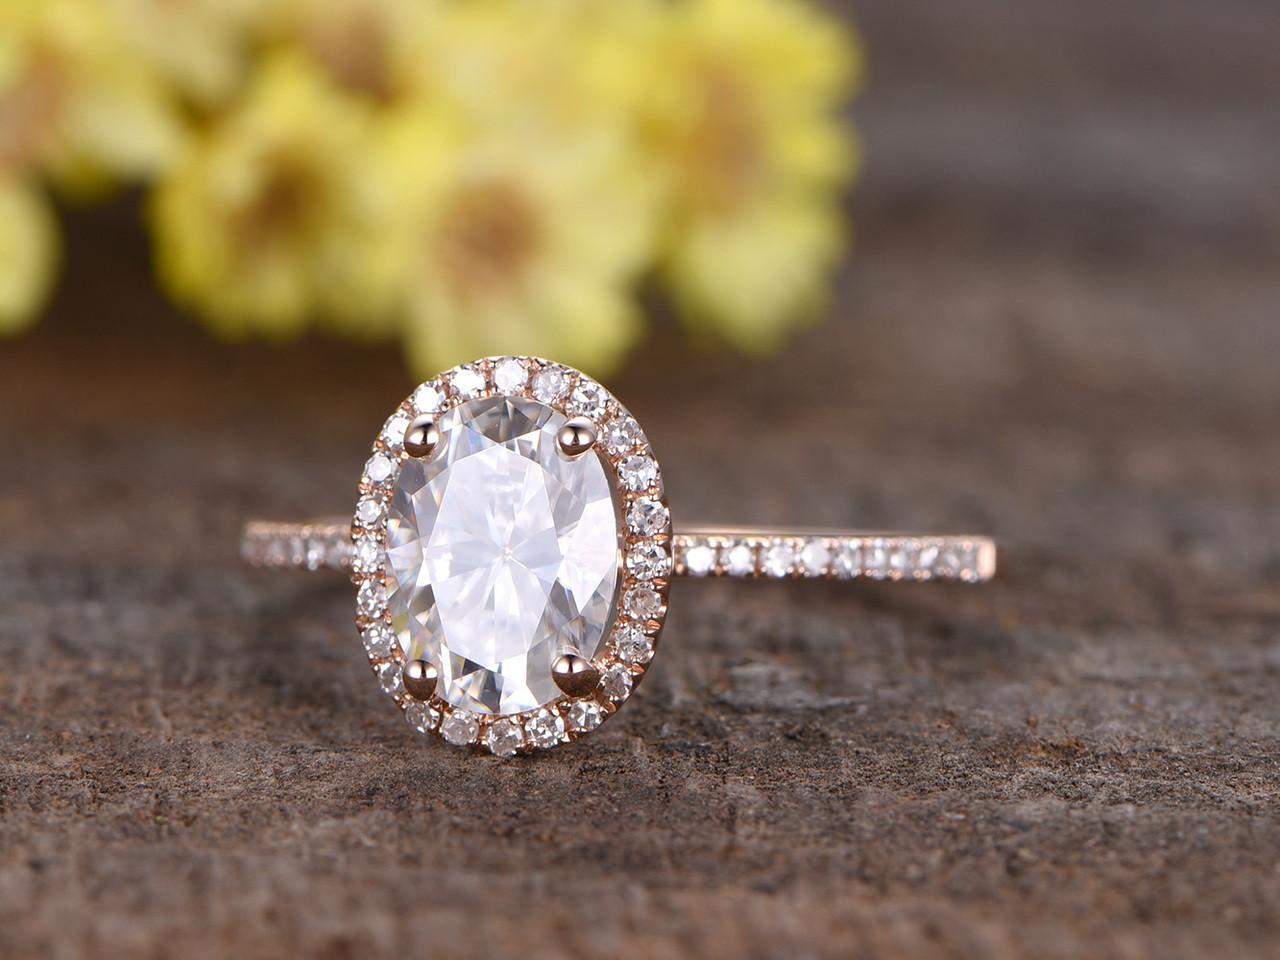 1 5 Carat Oval Moissanite Engagement Rings Diamond 14k Rose Gold Halo Thin  Design Stacking Band